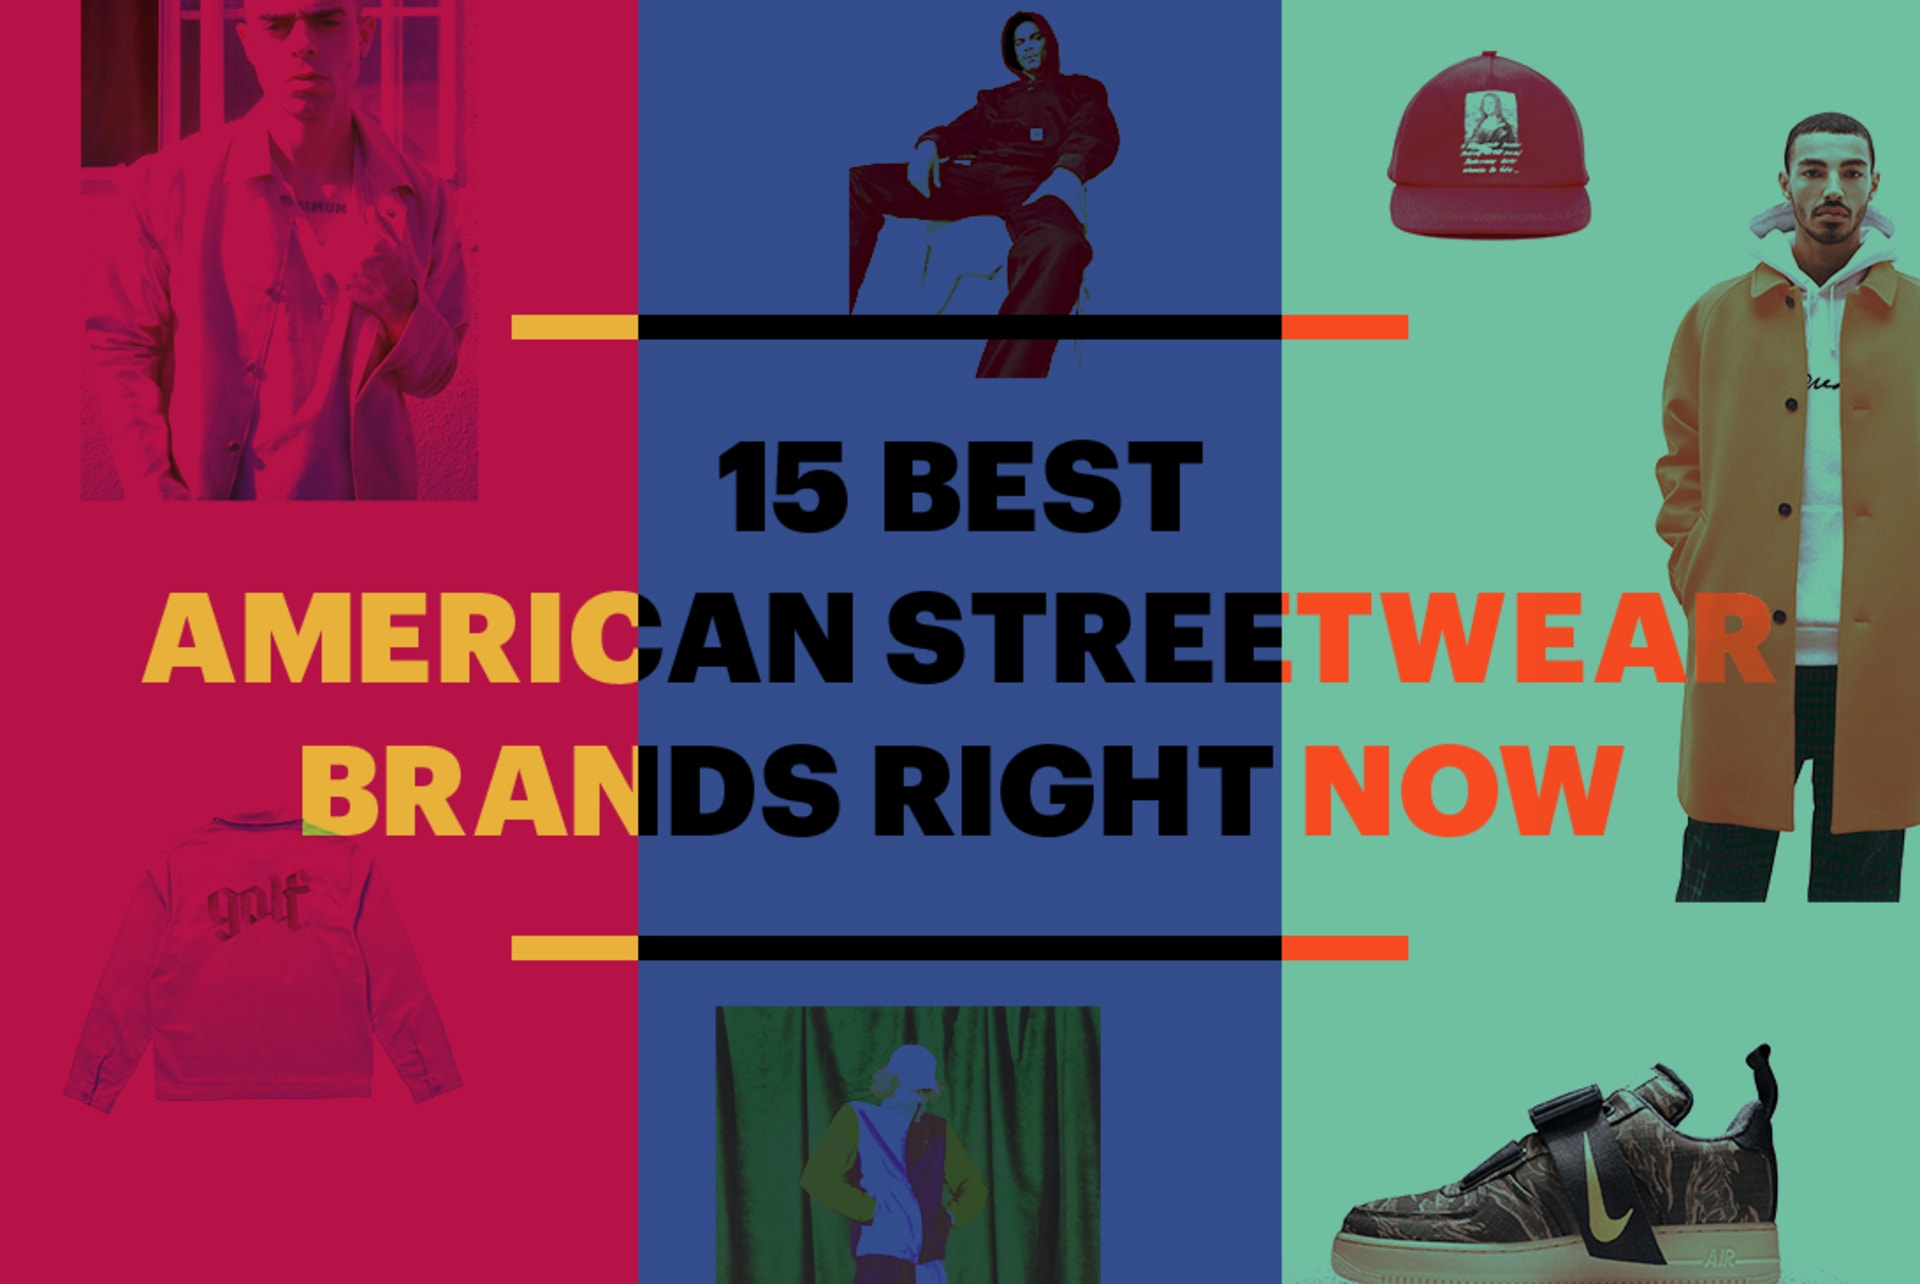 15 Best American Streetwear Brands Cover